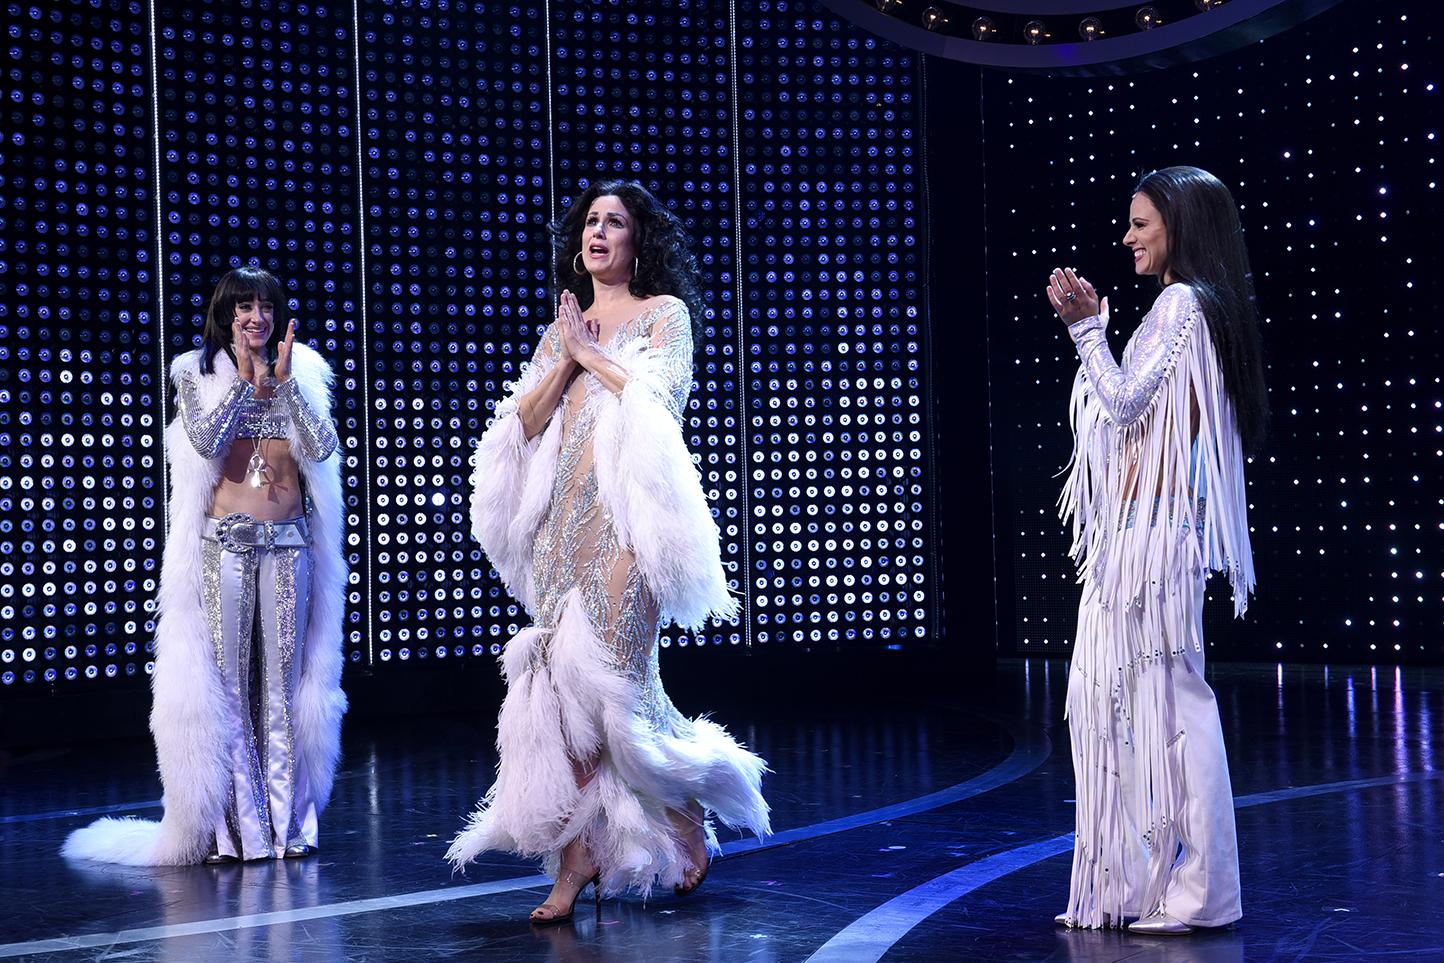 The Cher Show sound design